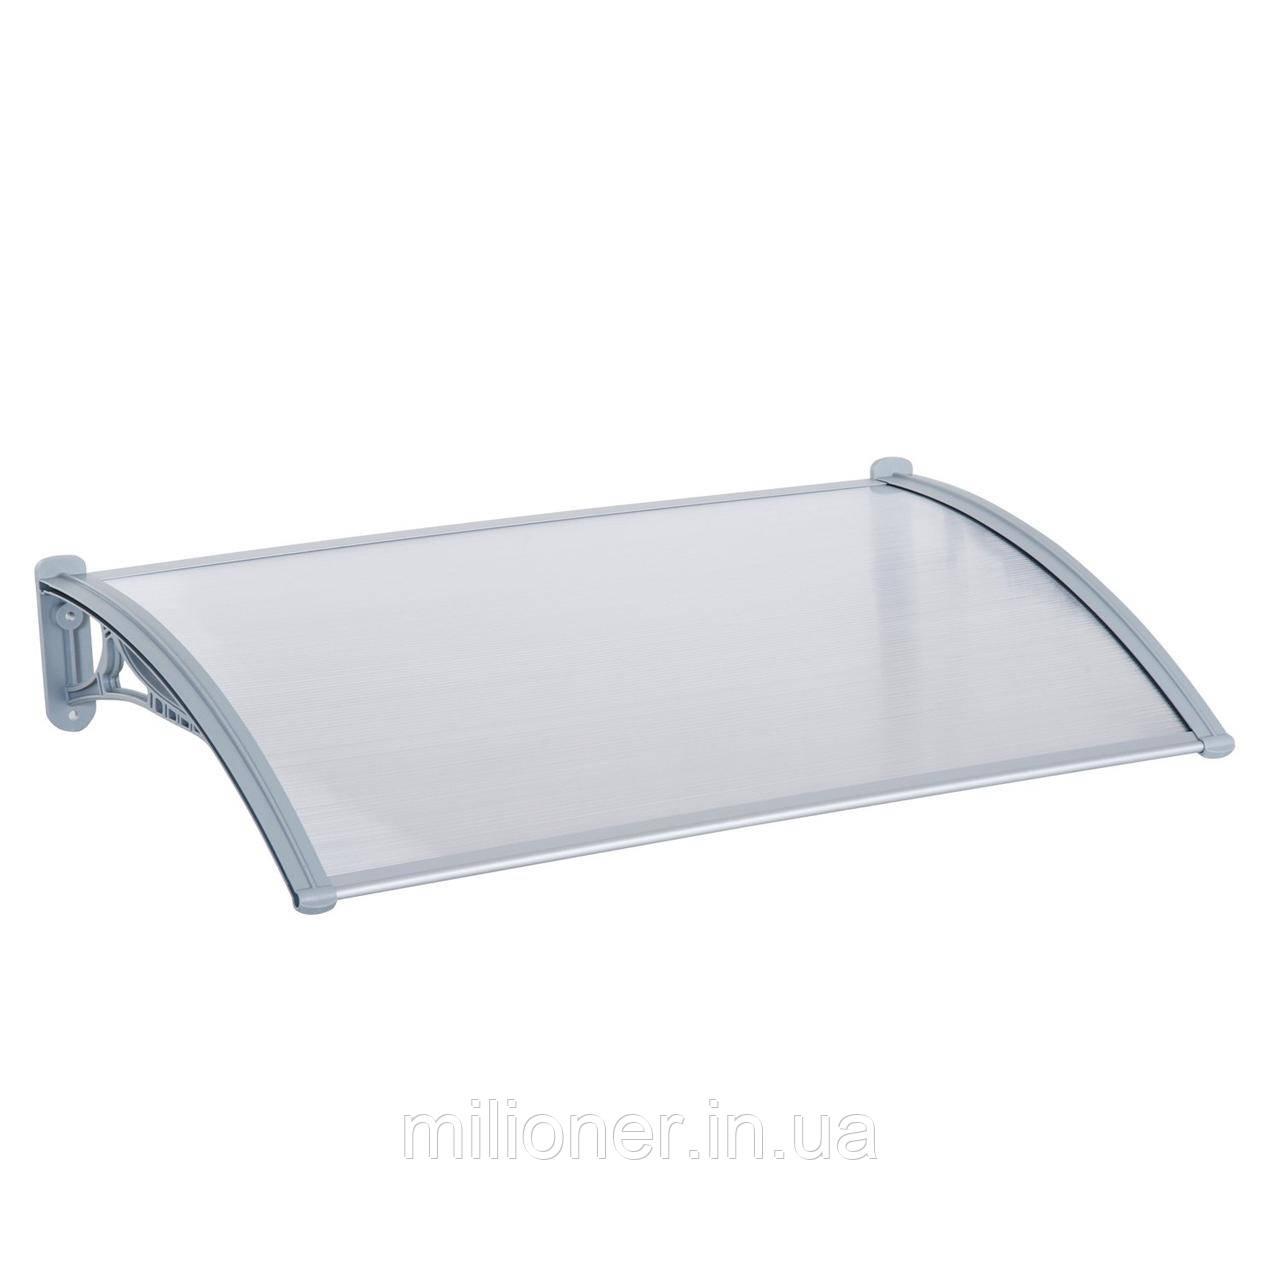 Навес для входных дверей Siker 1000-N (1000*1200) Grey